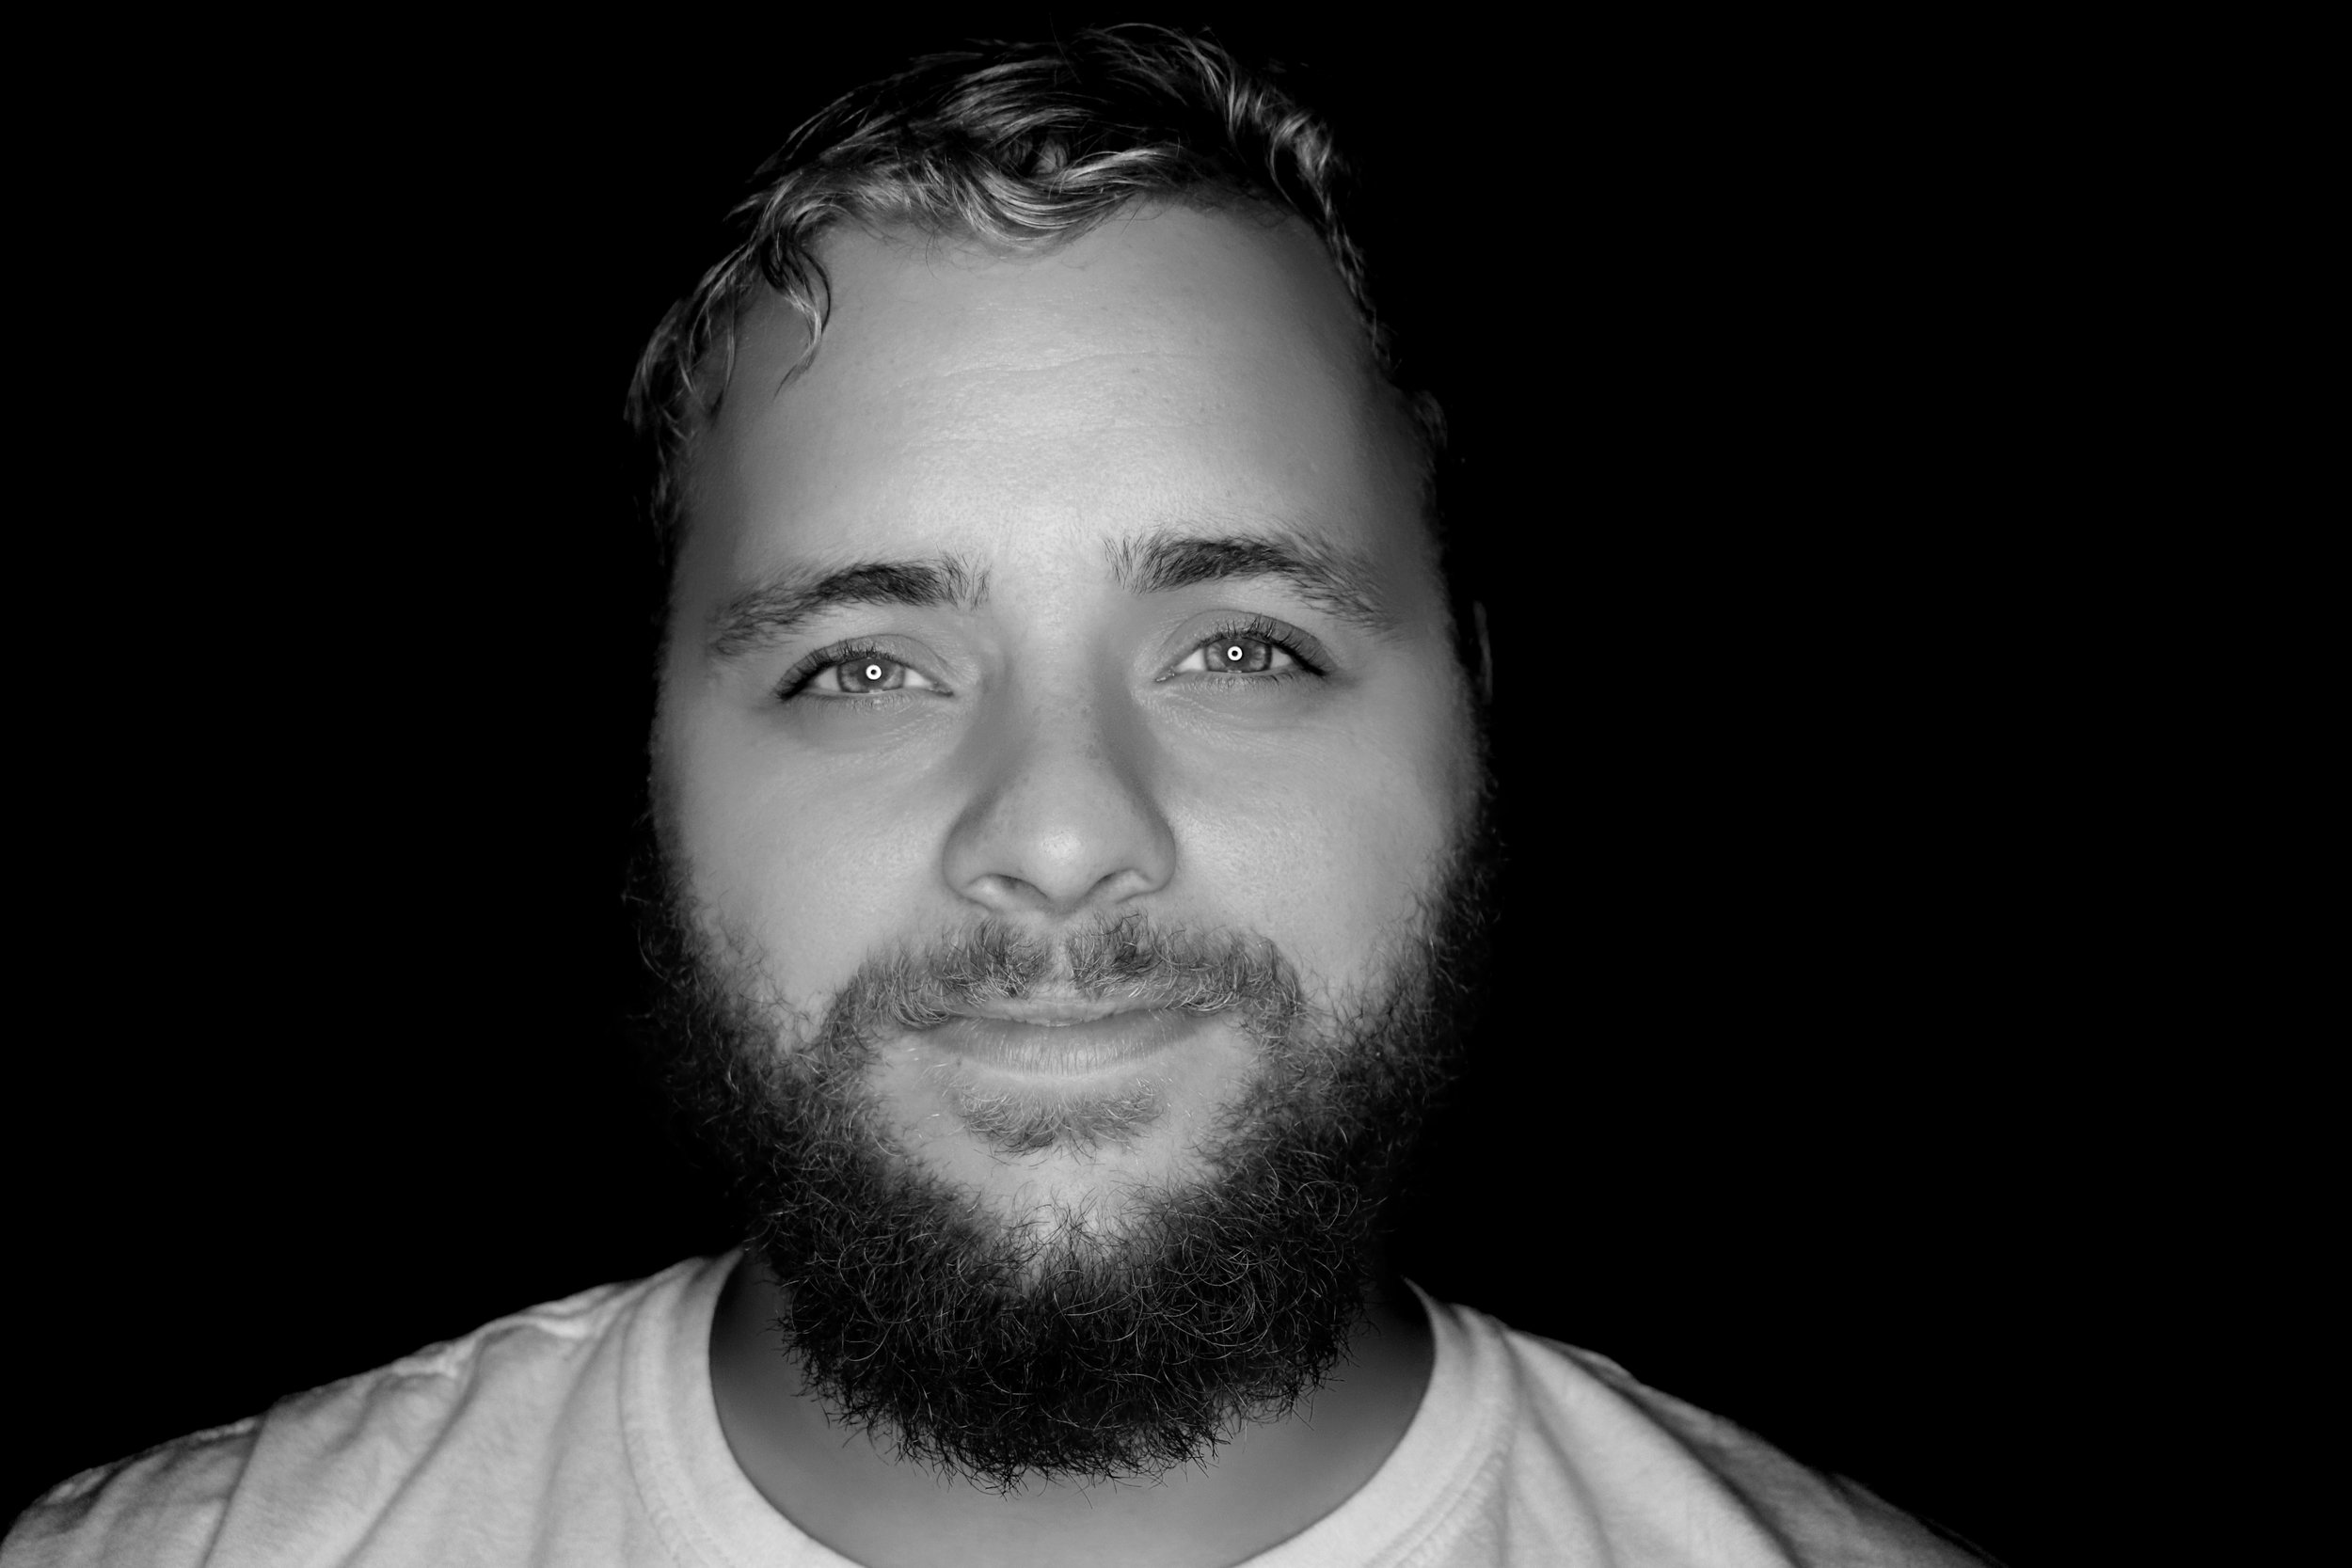 Sam Burris - Electrician & Electrical System Design Student